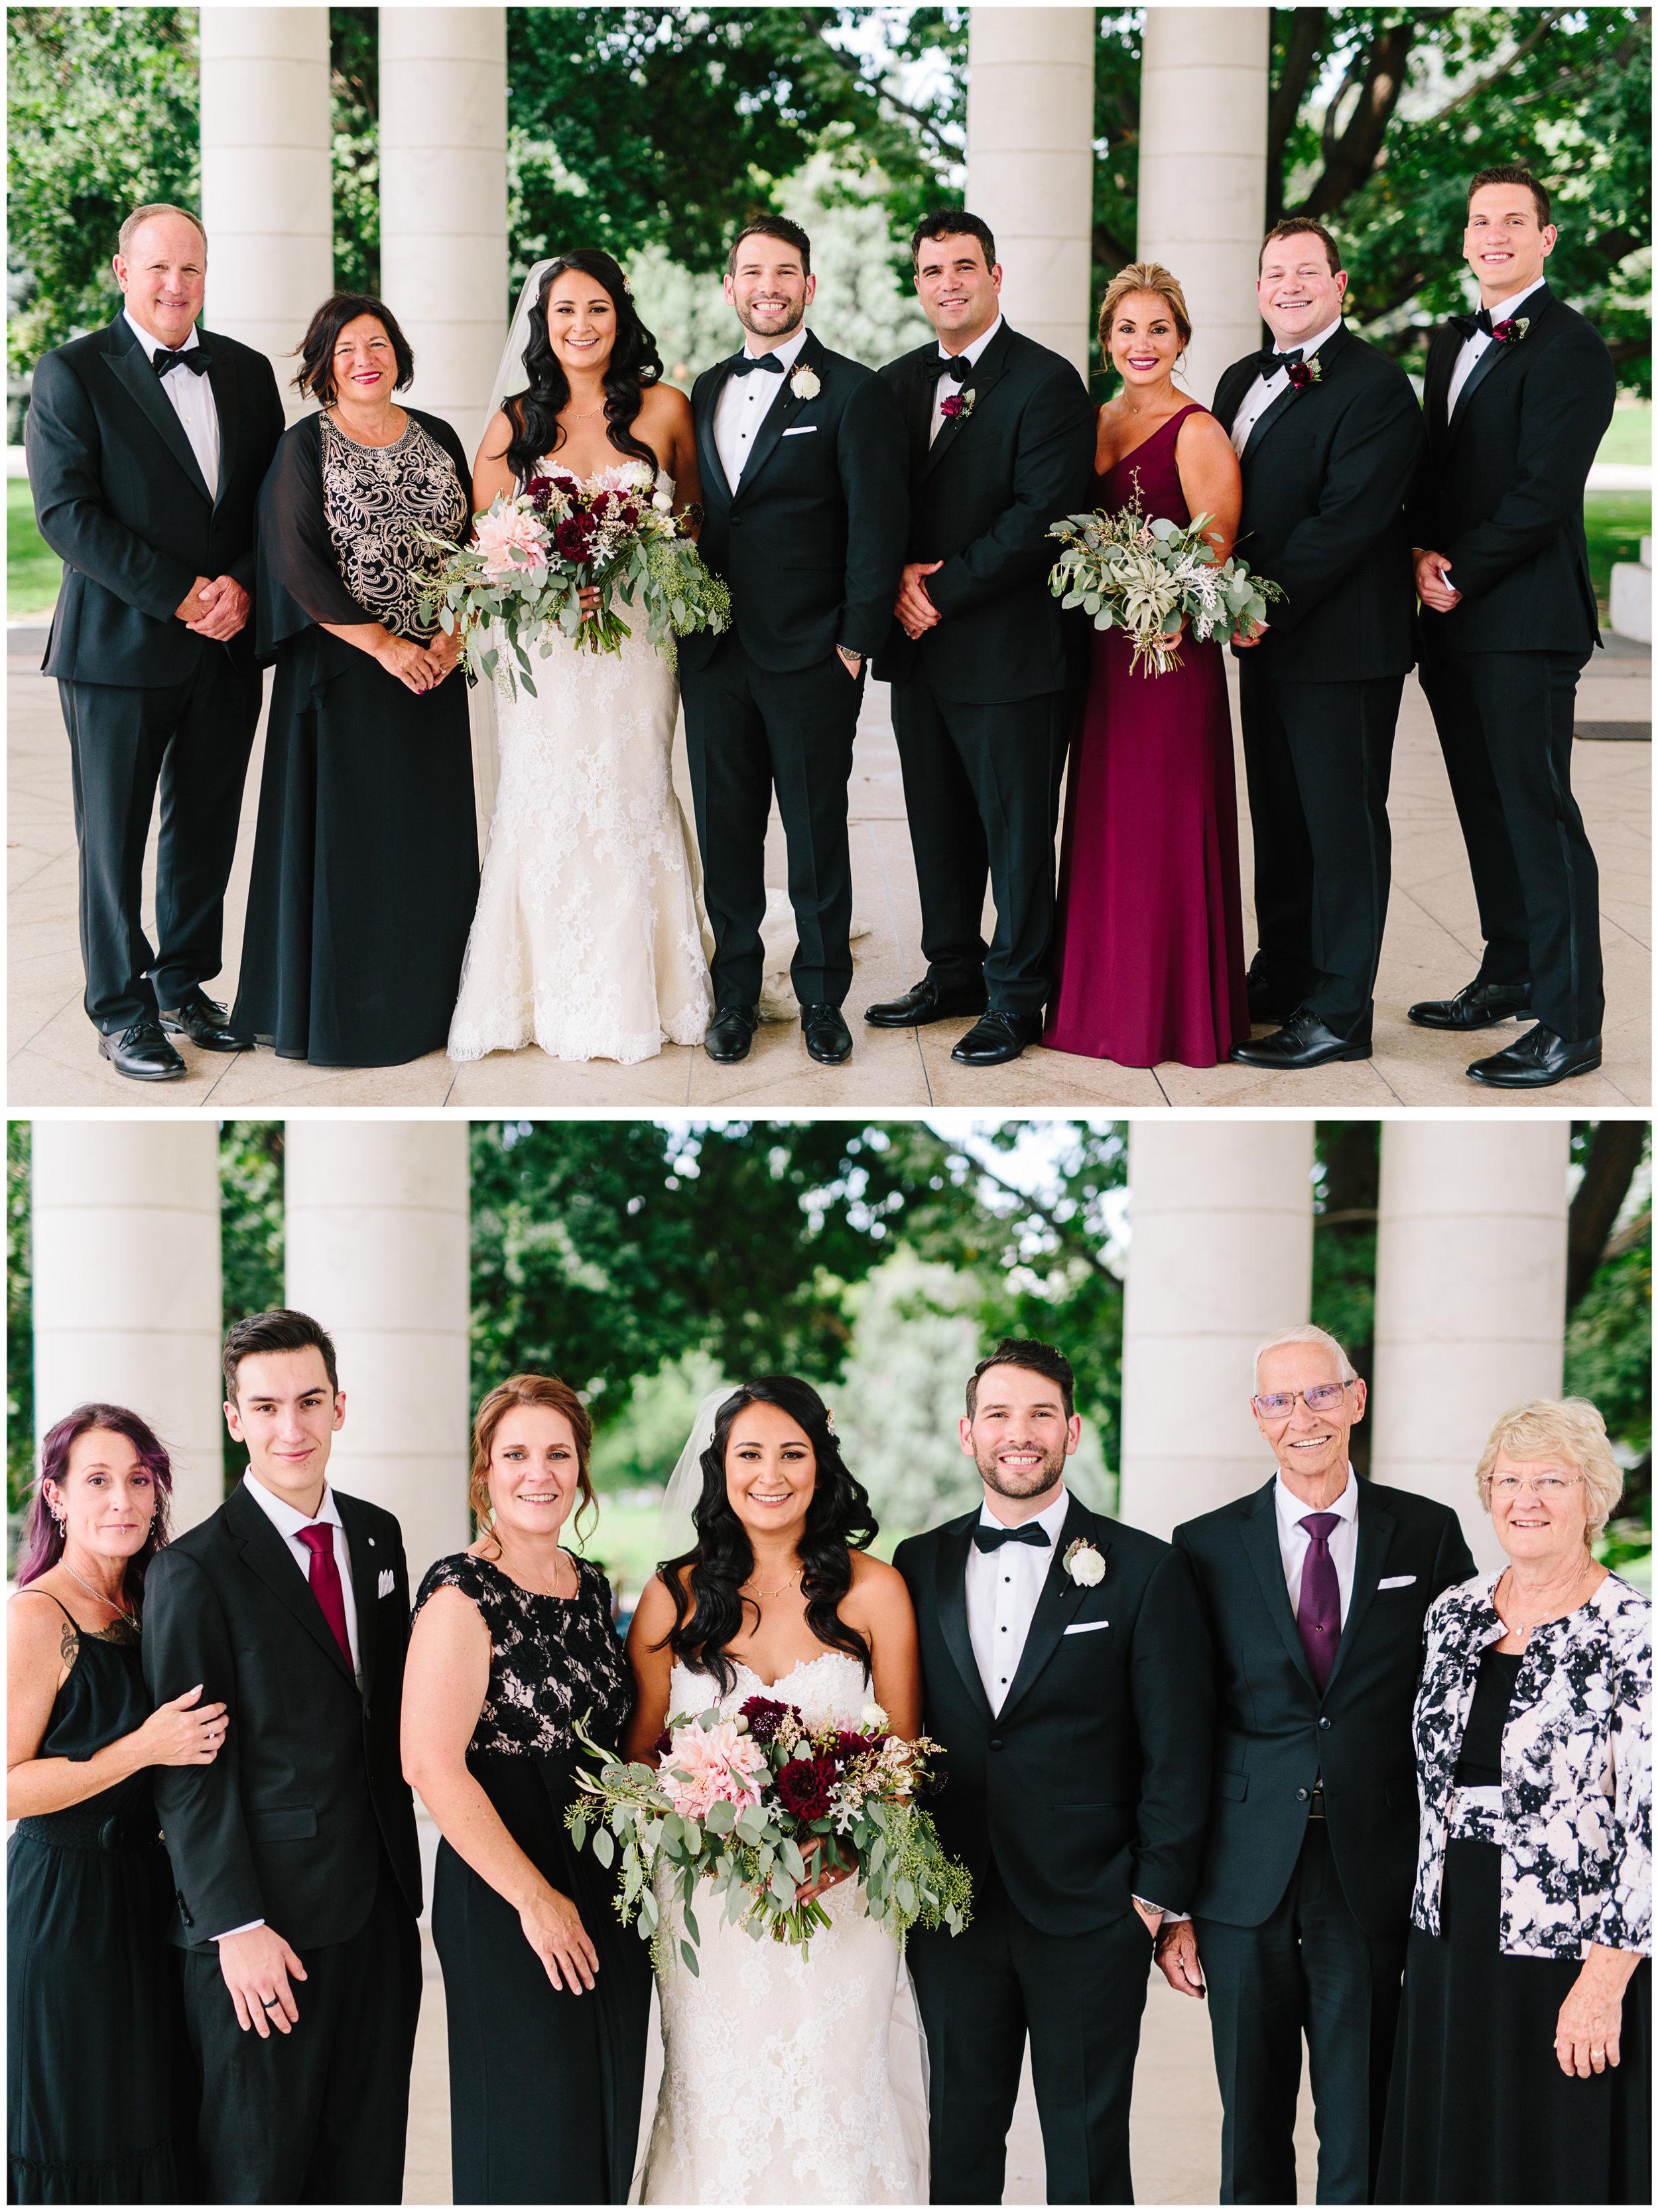 moss_denver_wedding_43.jpg